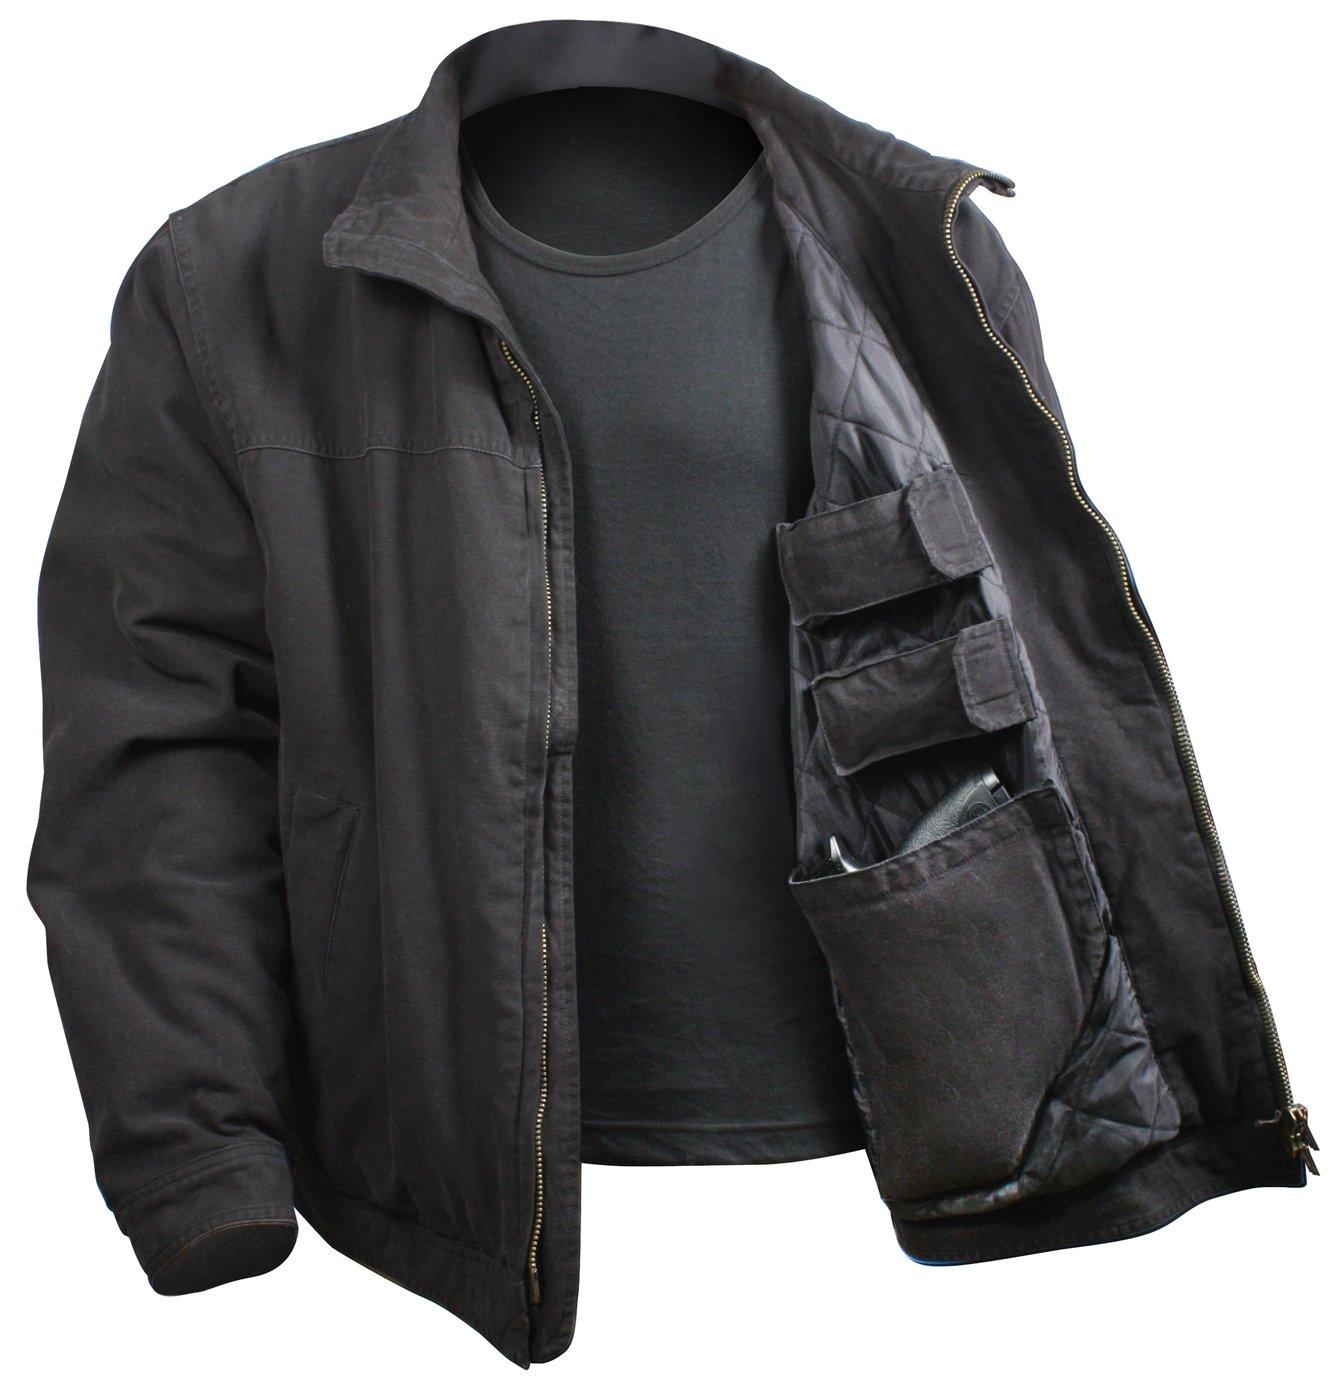 Rothco 3 Season Concealed Carry Jacket, Black, 3X-Large/Large